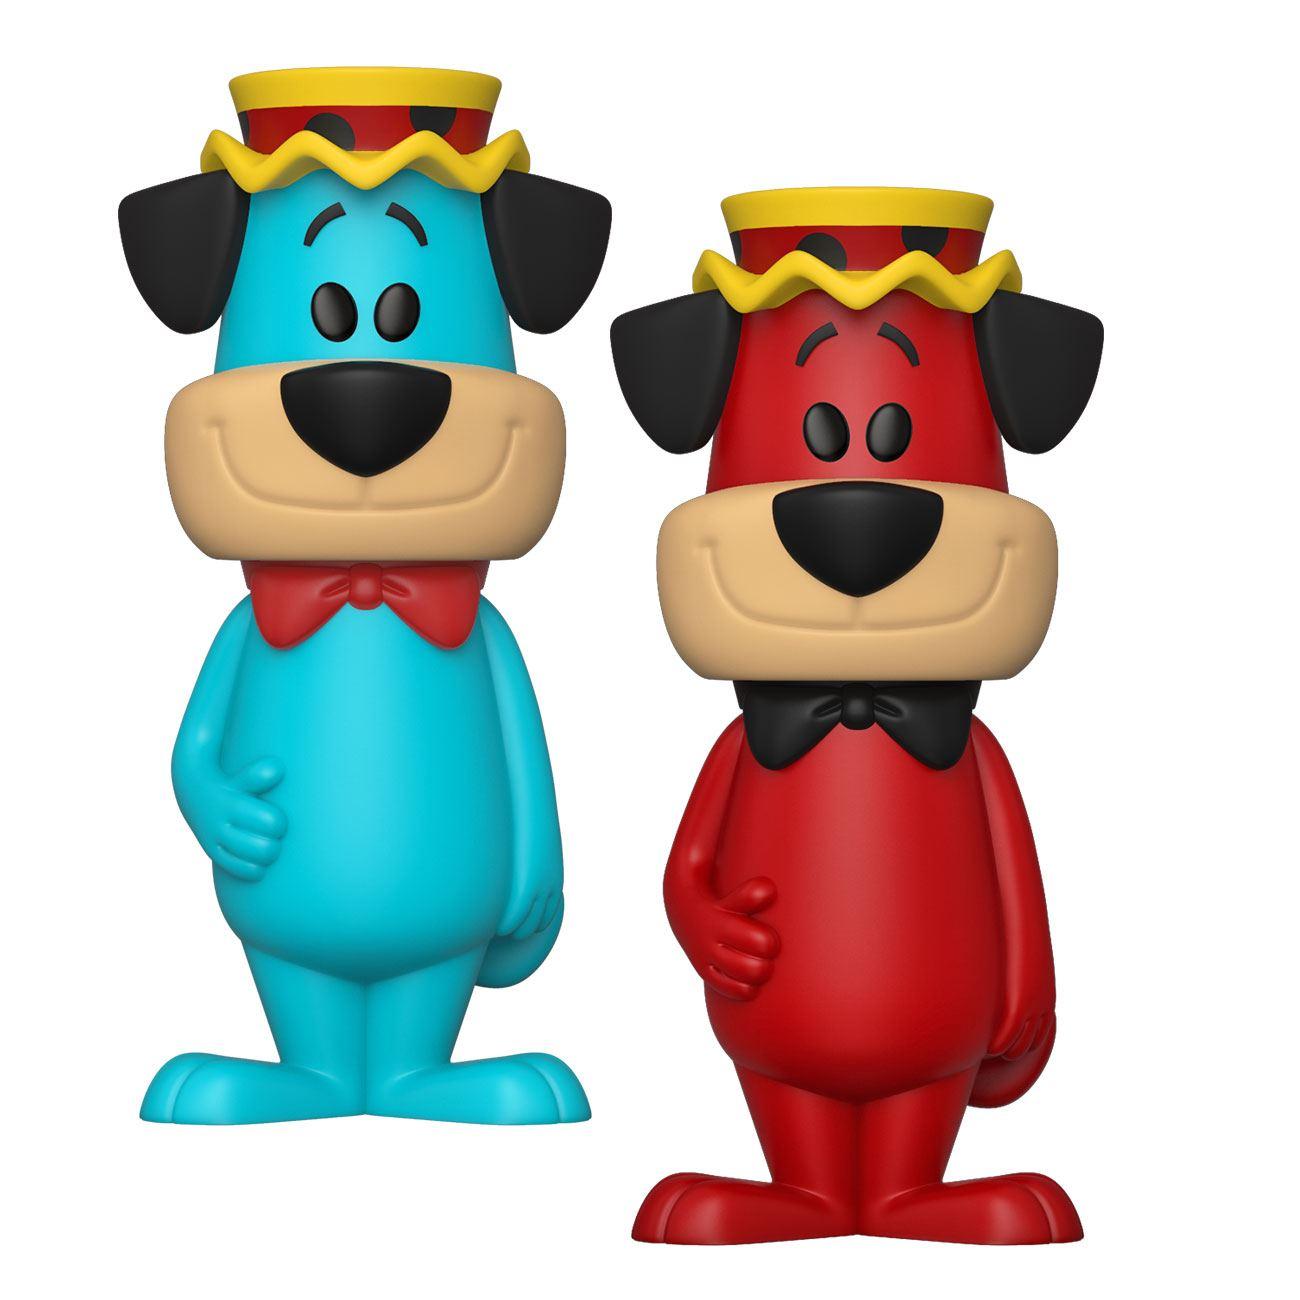 Hanna Barbera POP! Movies Vinyl SODA Figures Huckleberry Hound 11 cm Assortment (6)